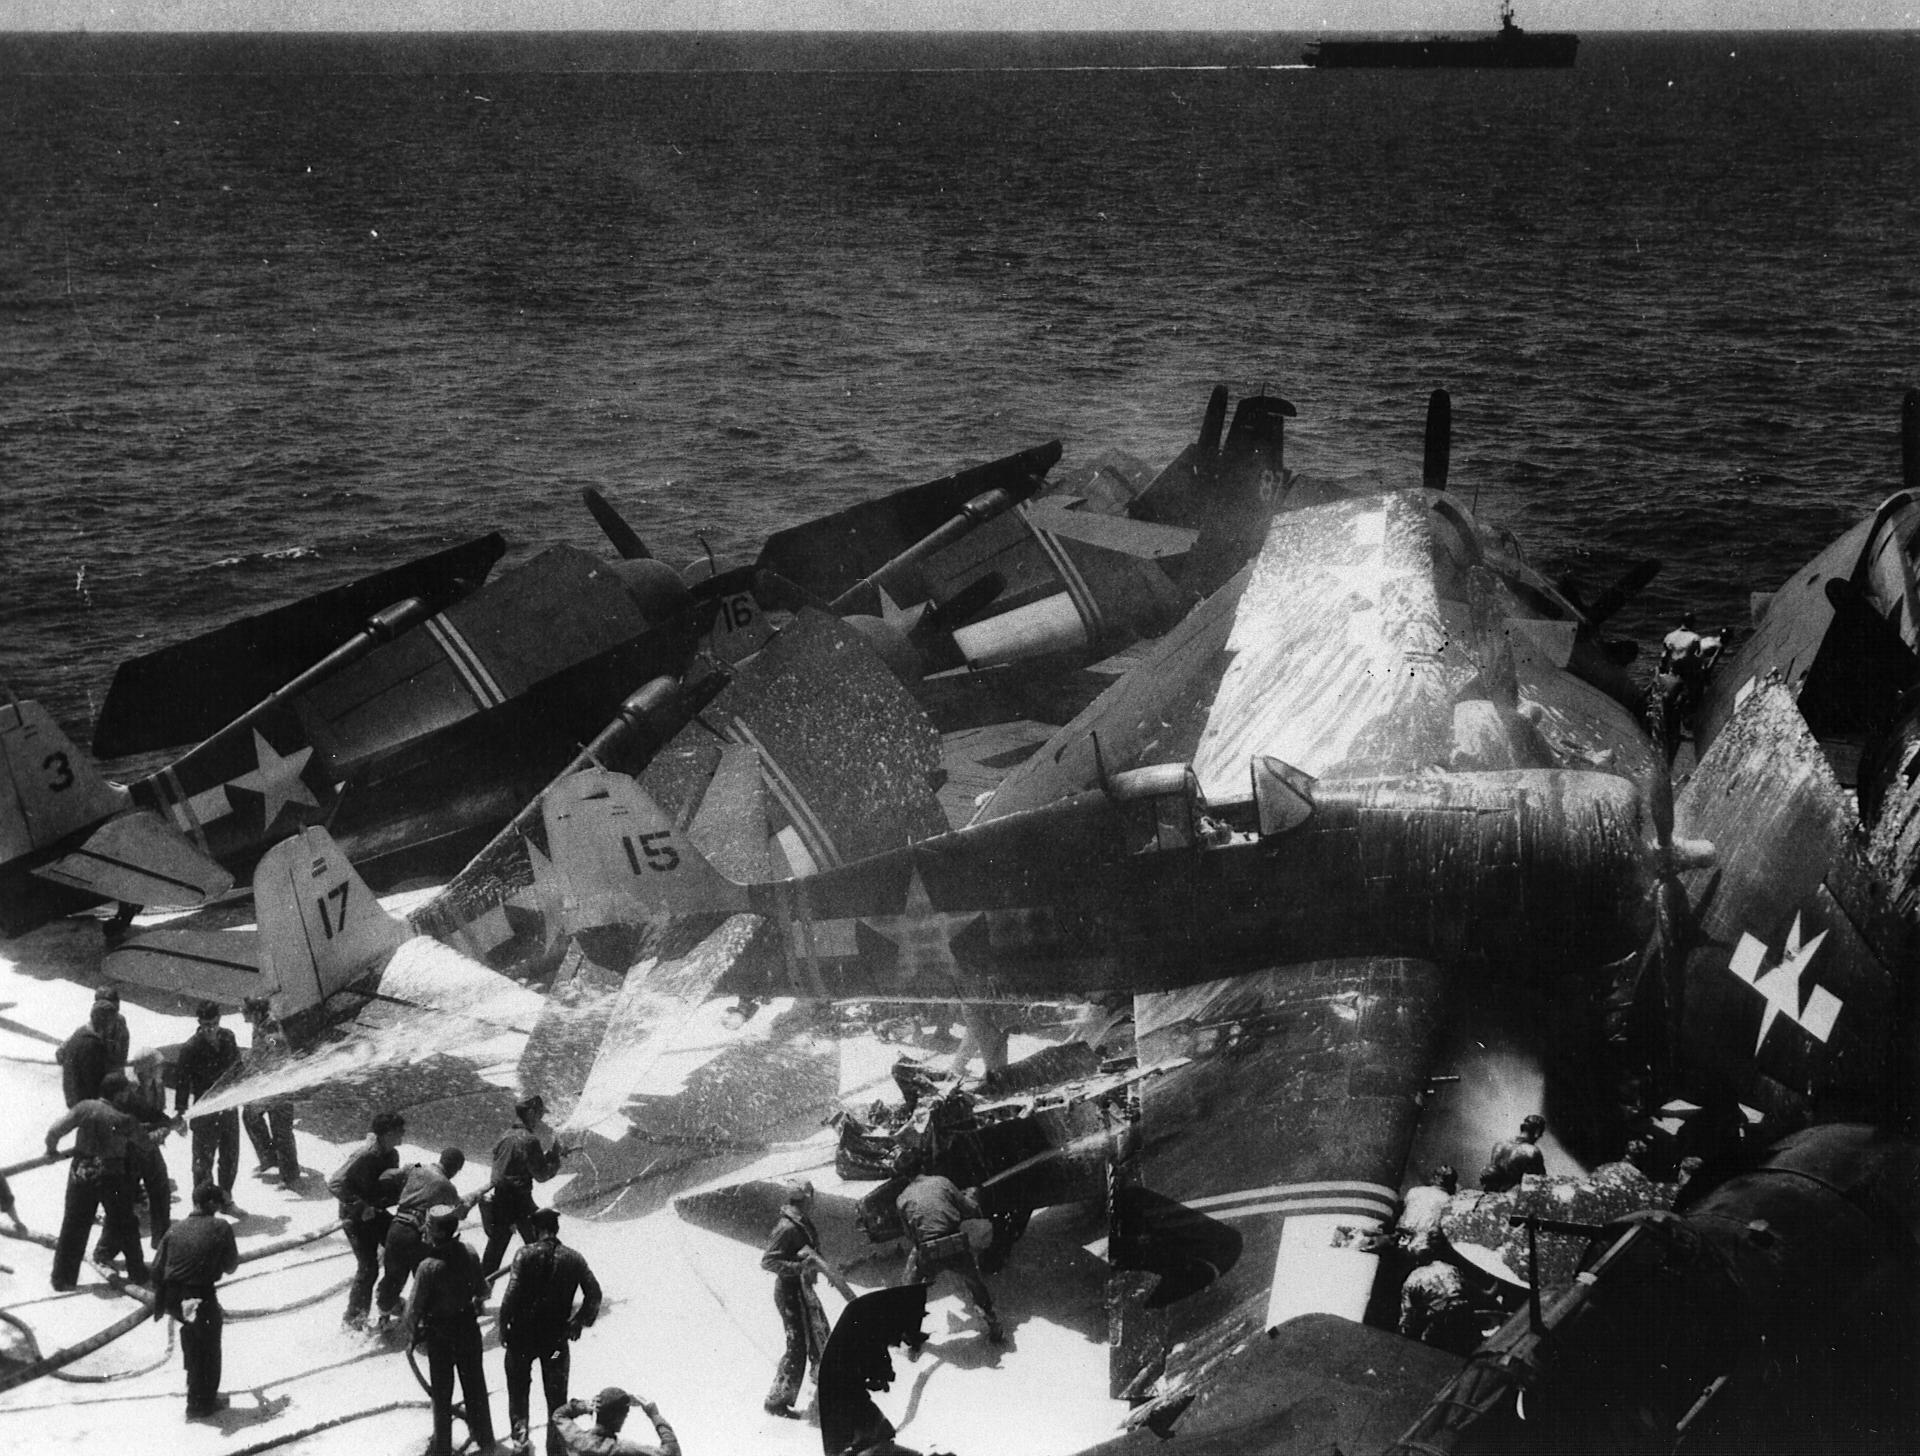 Grumman F6F 5 Hellcat VF 24 Black 15 landing mishap CVE 27 USS Suwanee Aug 1945 01